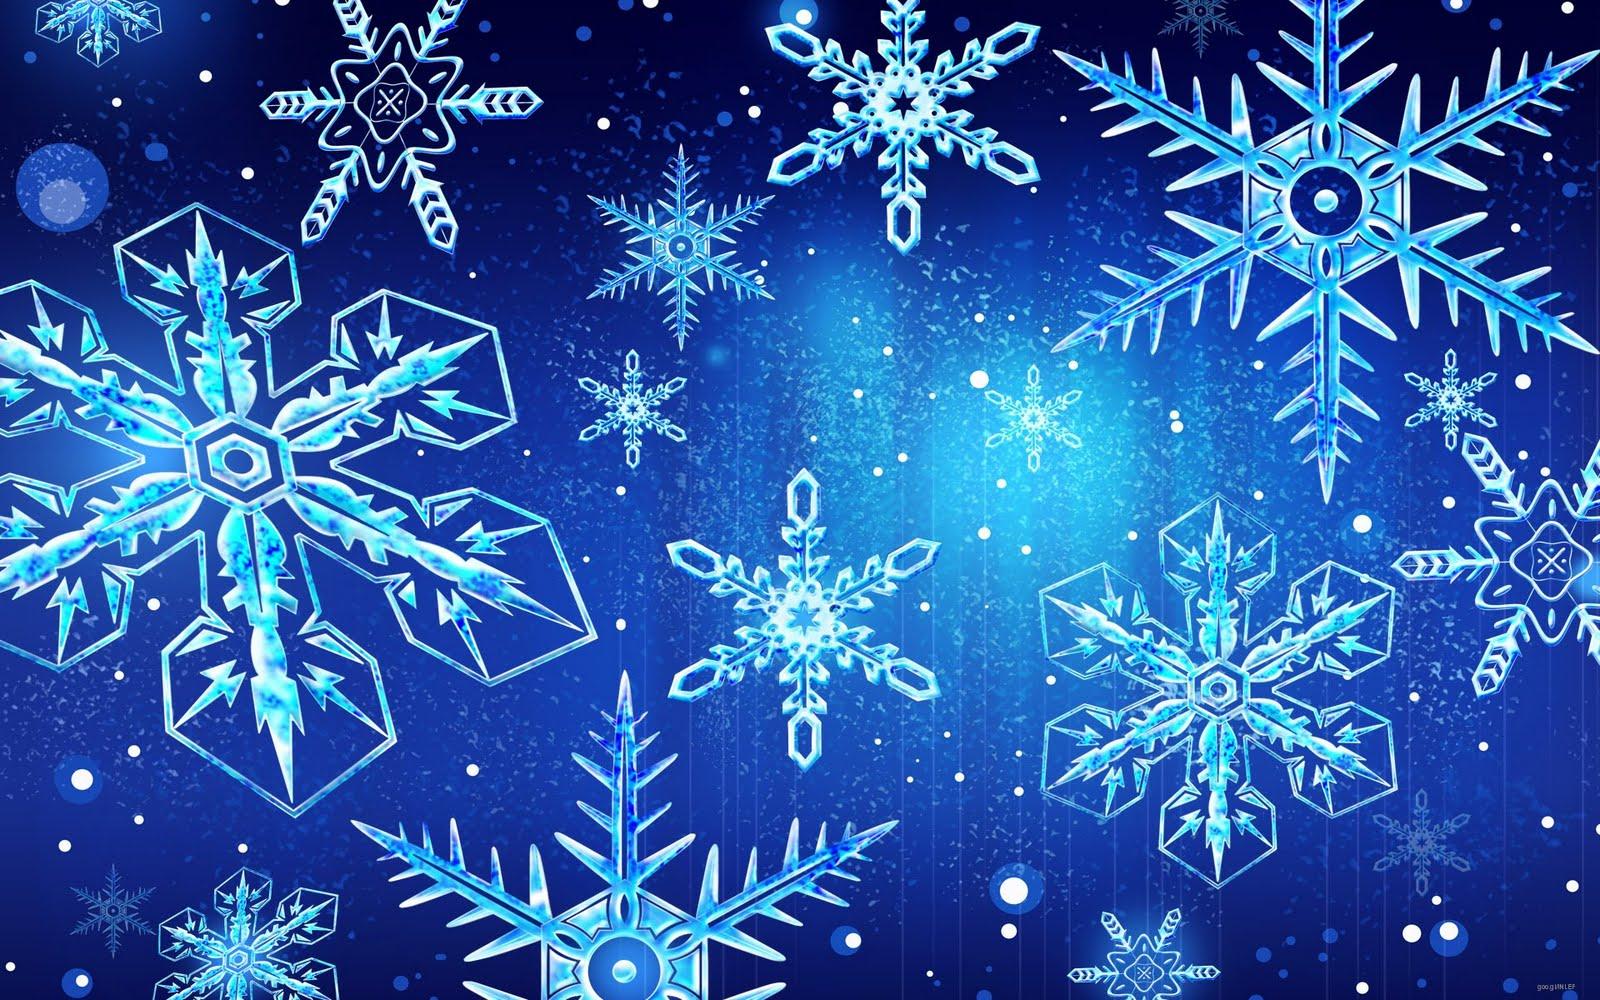 Sfondi Gratis Natalizi.Sfondi Gratis Natale